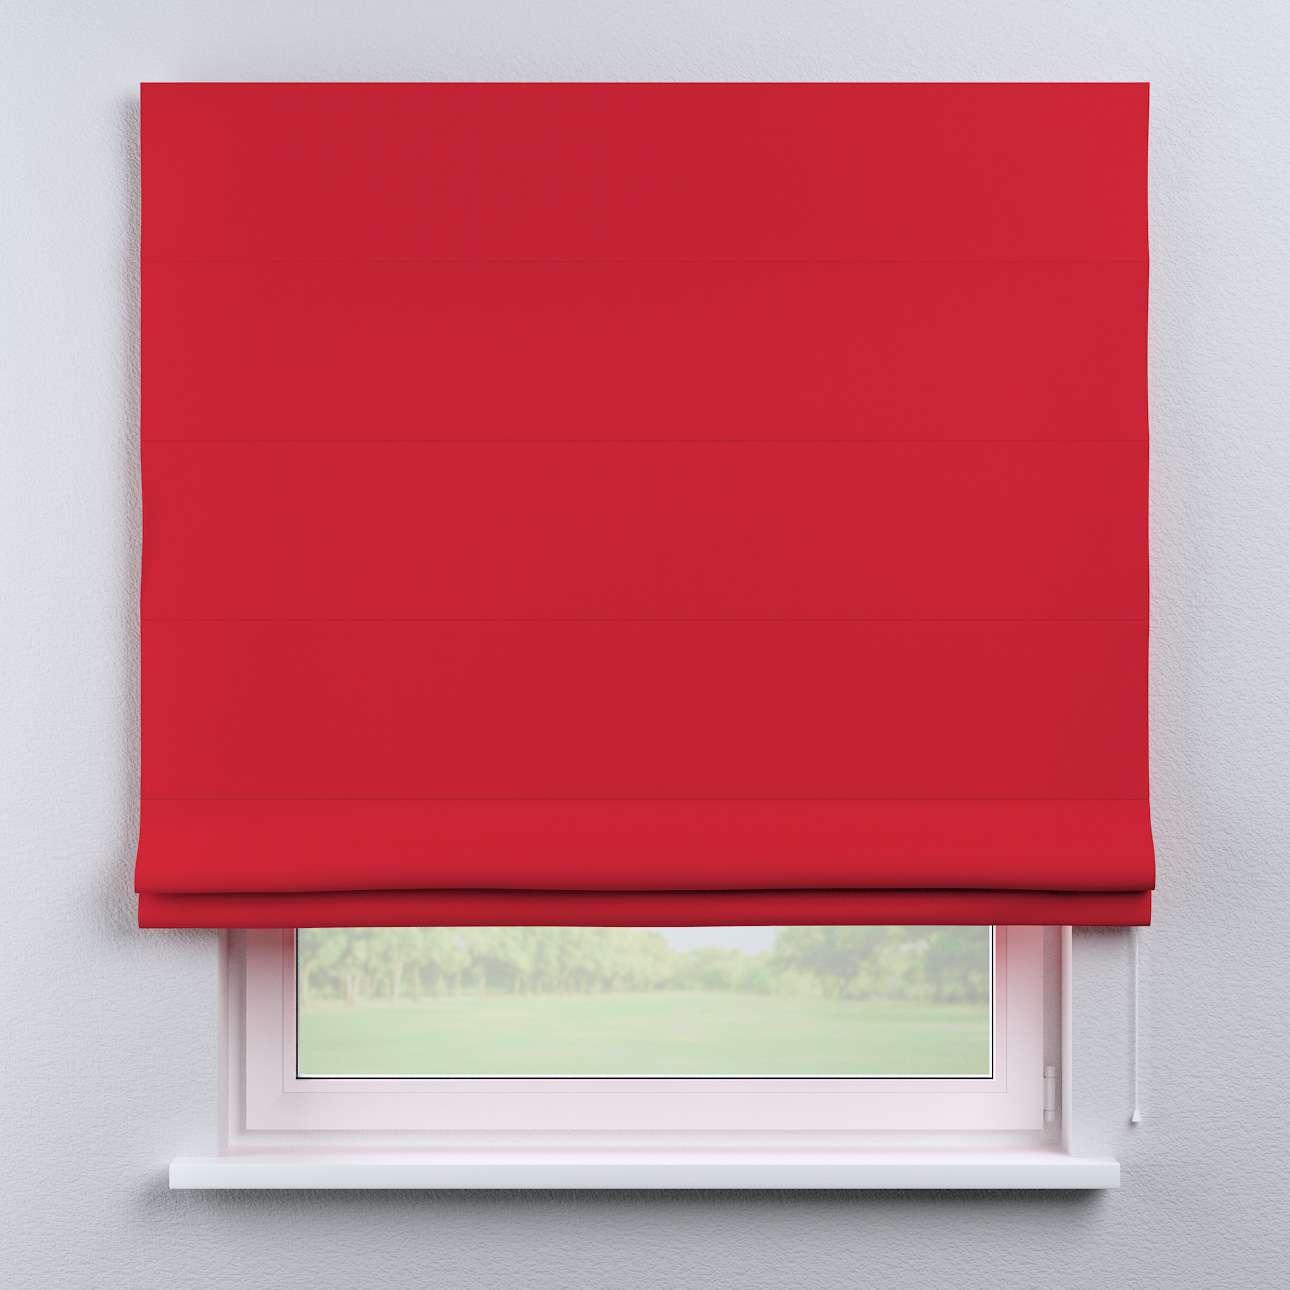 Foldegardin Capri<br/>Uden flæsekant 80 x 170 cm fra kollektionen Cotton Panama, Stof: 702-04